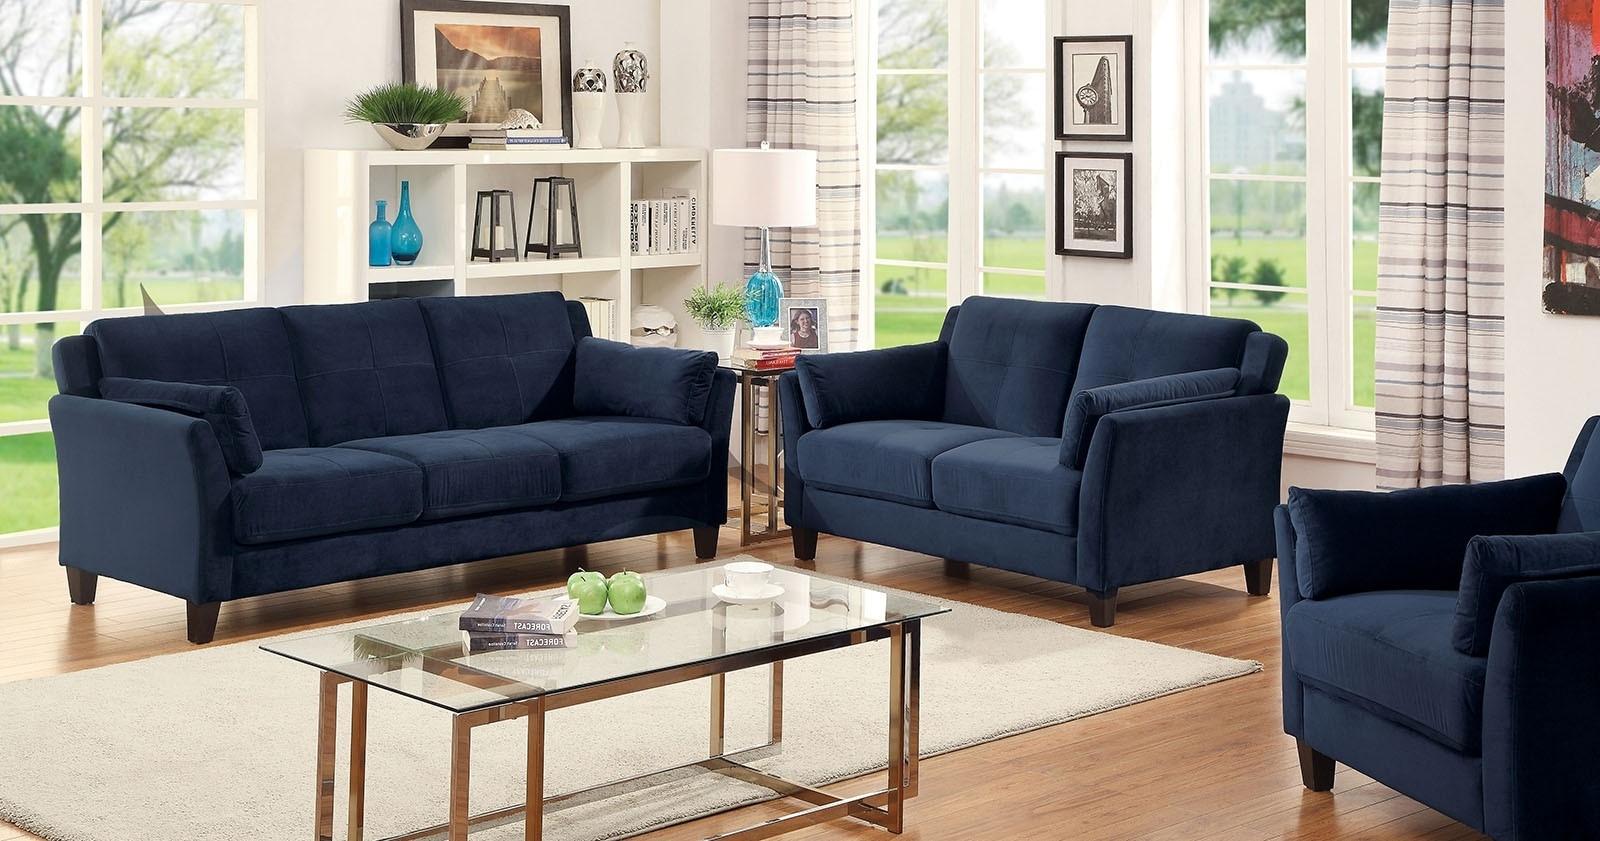 Latest Dark Blue Sofas With Regard To Sale 249494 Royal Home Sofa Set Riva Dark Blue 3Pc Sofa Awesome (View 8 of 15)